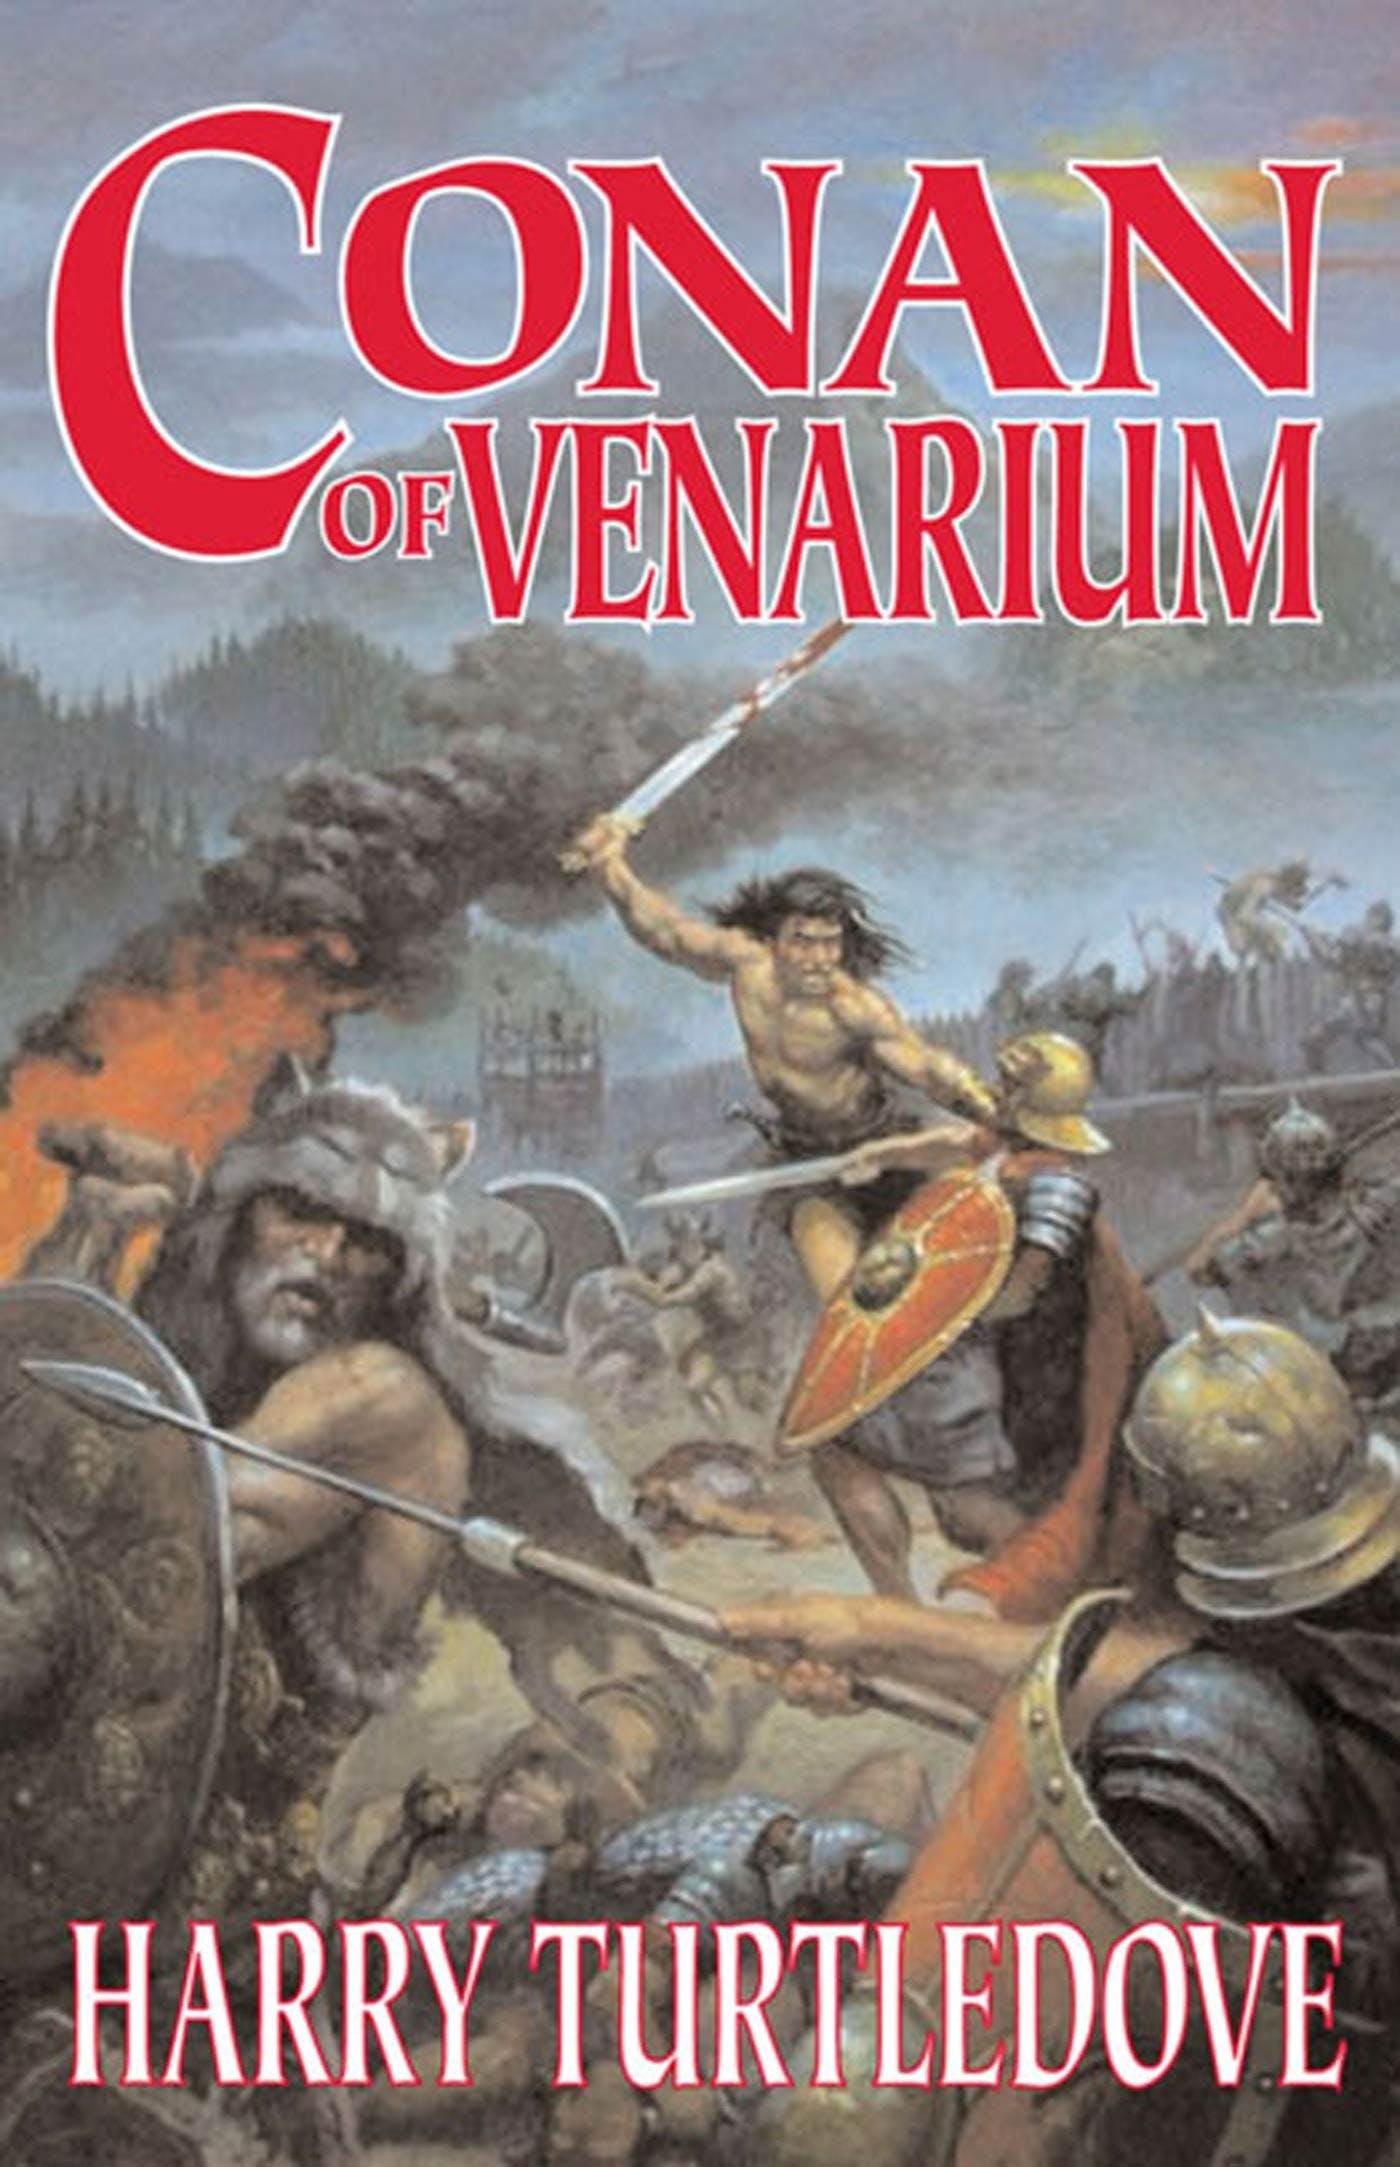 Image of Conan of Venarium